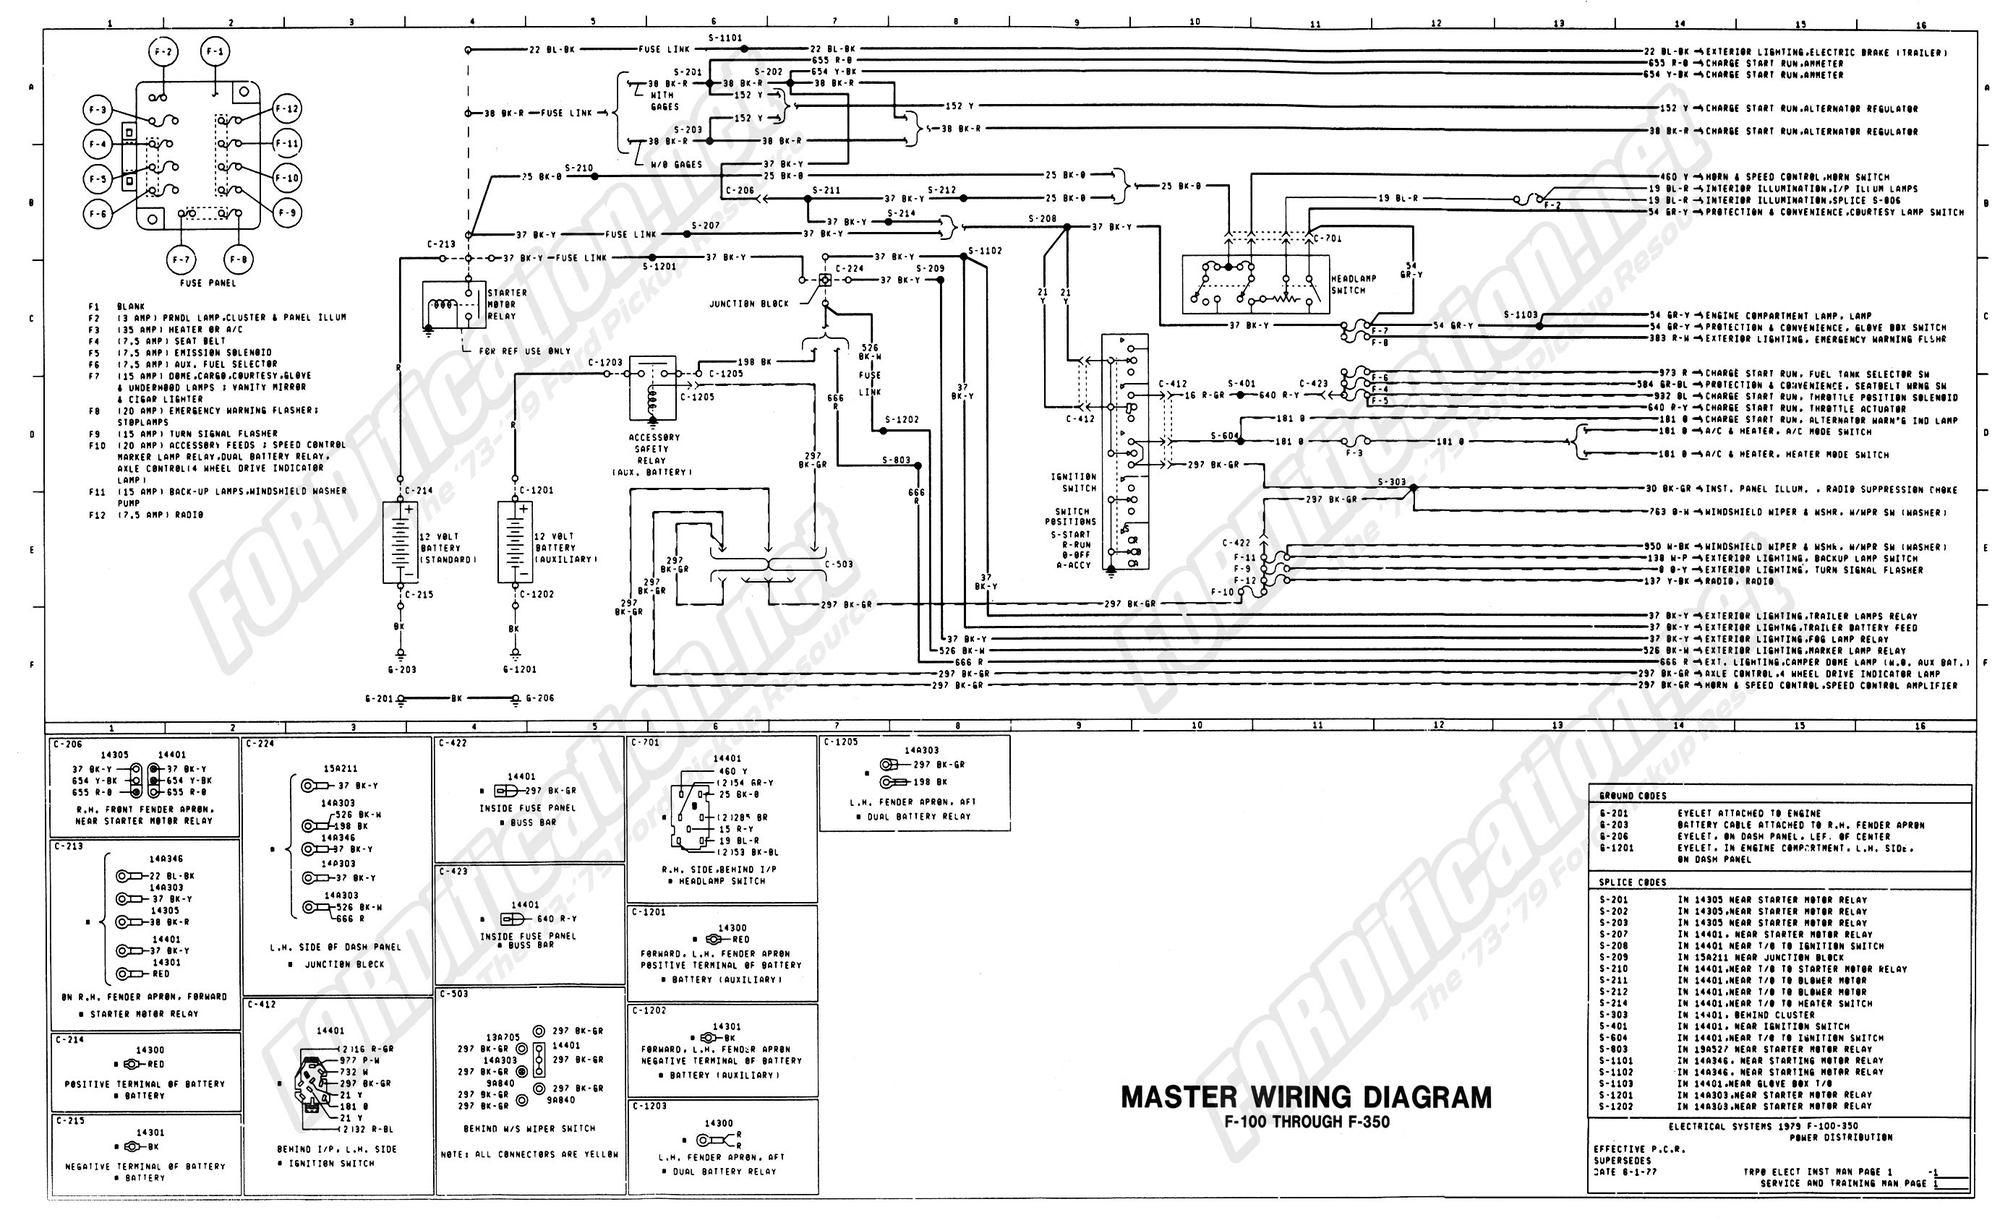 Automactic International Starter Wiring Diagram on